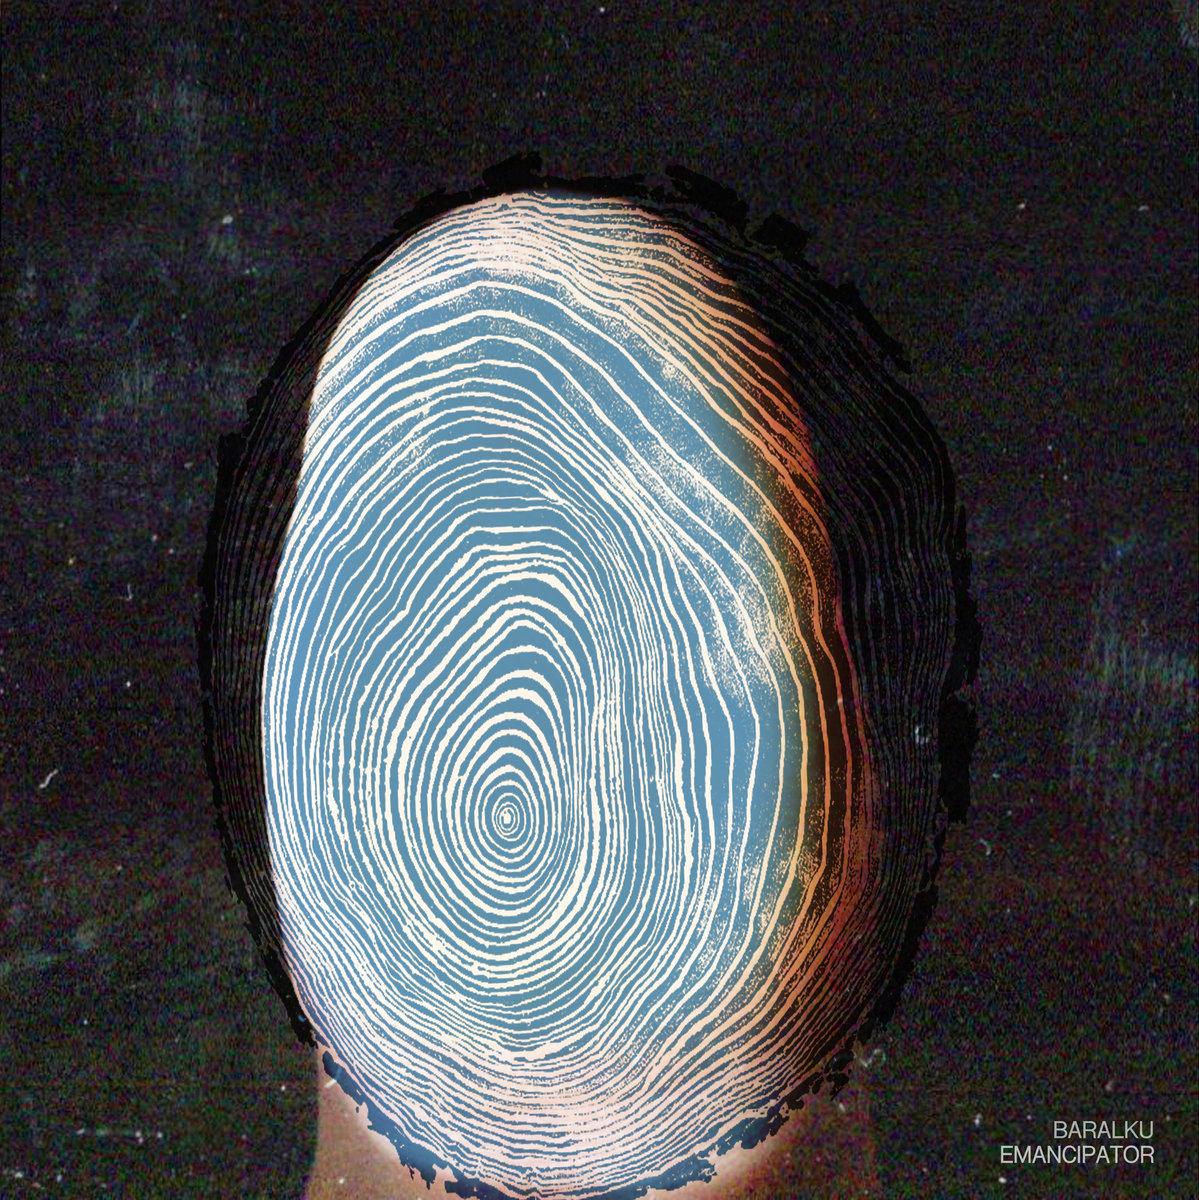 Emancipator's Ethereal New Album 'Baralku' Transcends Expectations